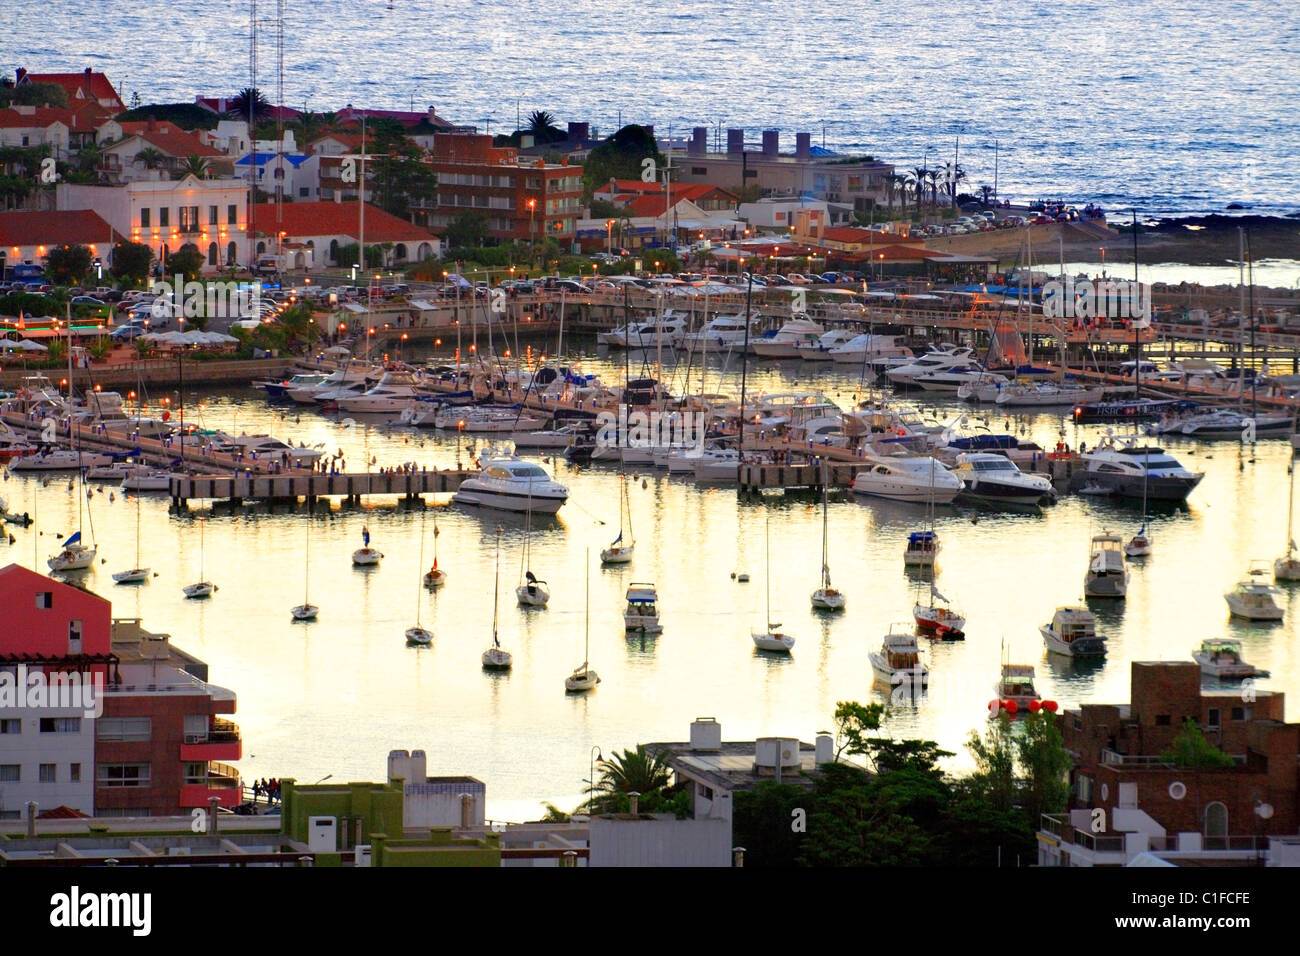 aerial view of yacht  club and harbor at Punta del Este coast, at twilight. Maldonado, Uruguay, south america - Stock Image